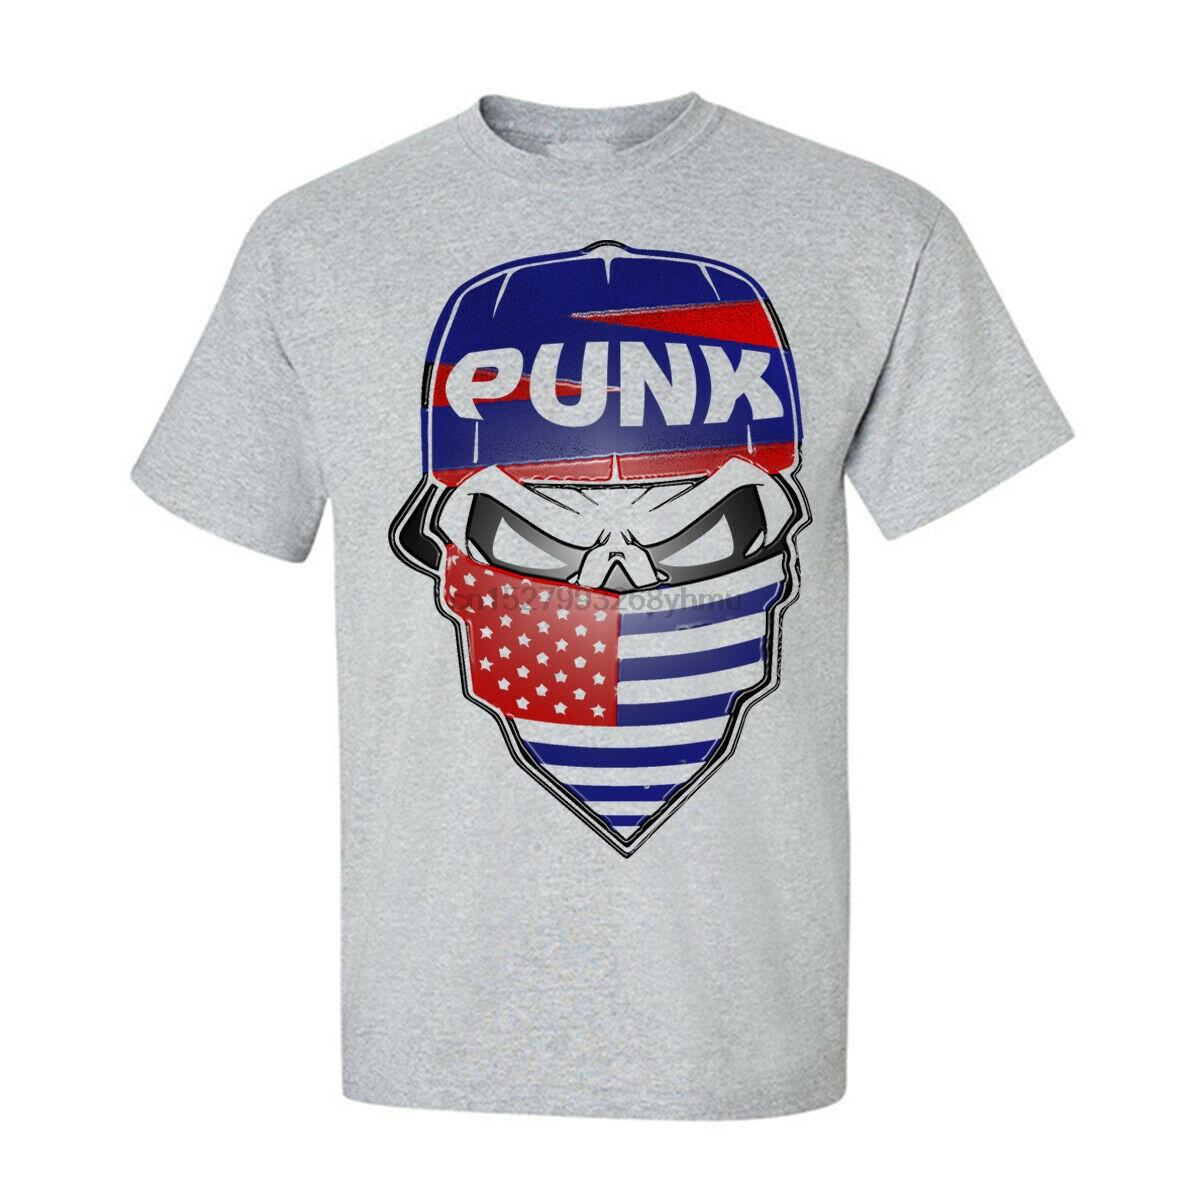 Americana Punk Skull Mens Tees novità unisex generico grafico divertente T-shirt